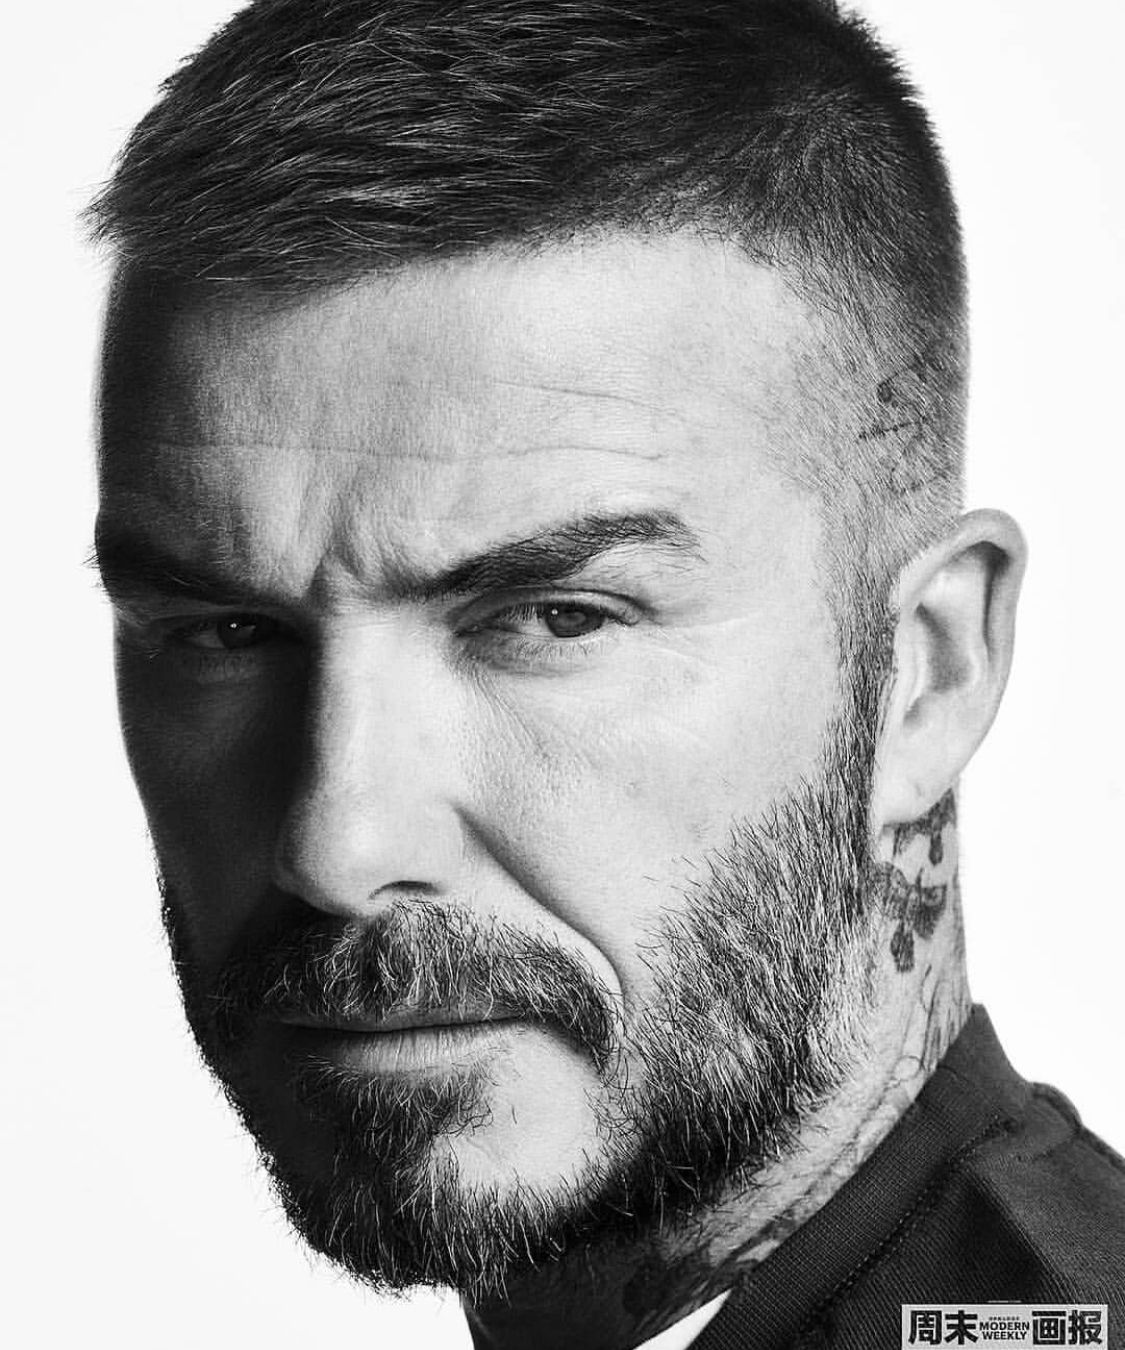 Pin By Raushan Singh On Menshairstyle In 2020 David Beckham Hairstyle Short David Beckham Hairstyle Beckham Haircut